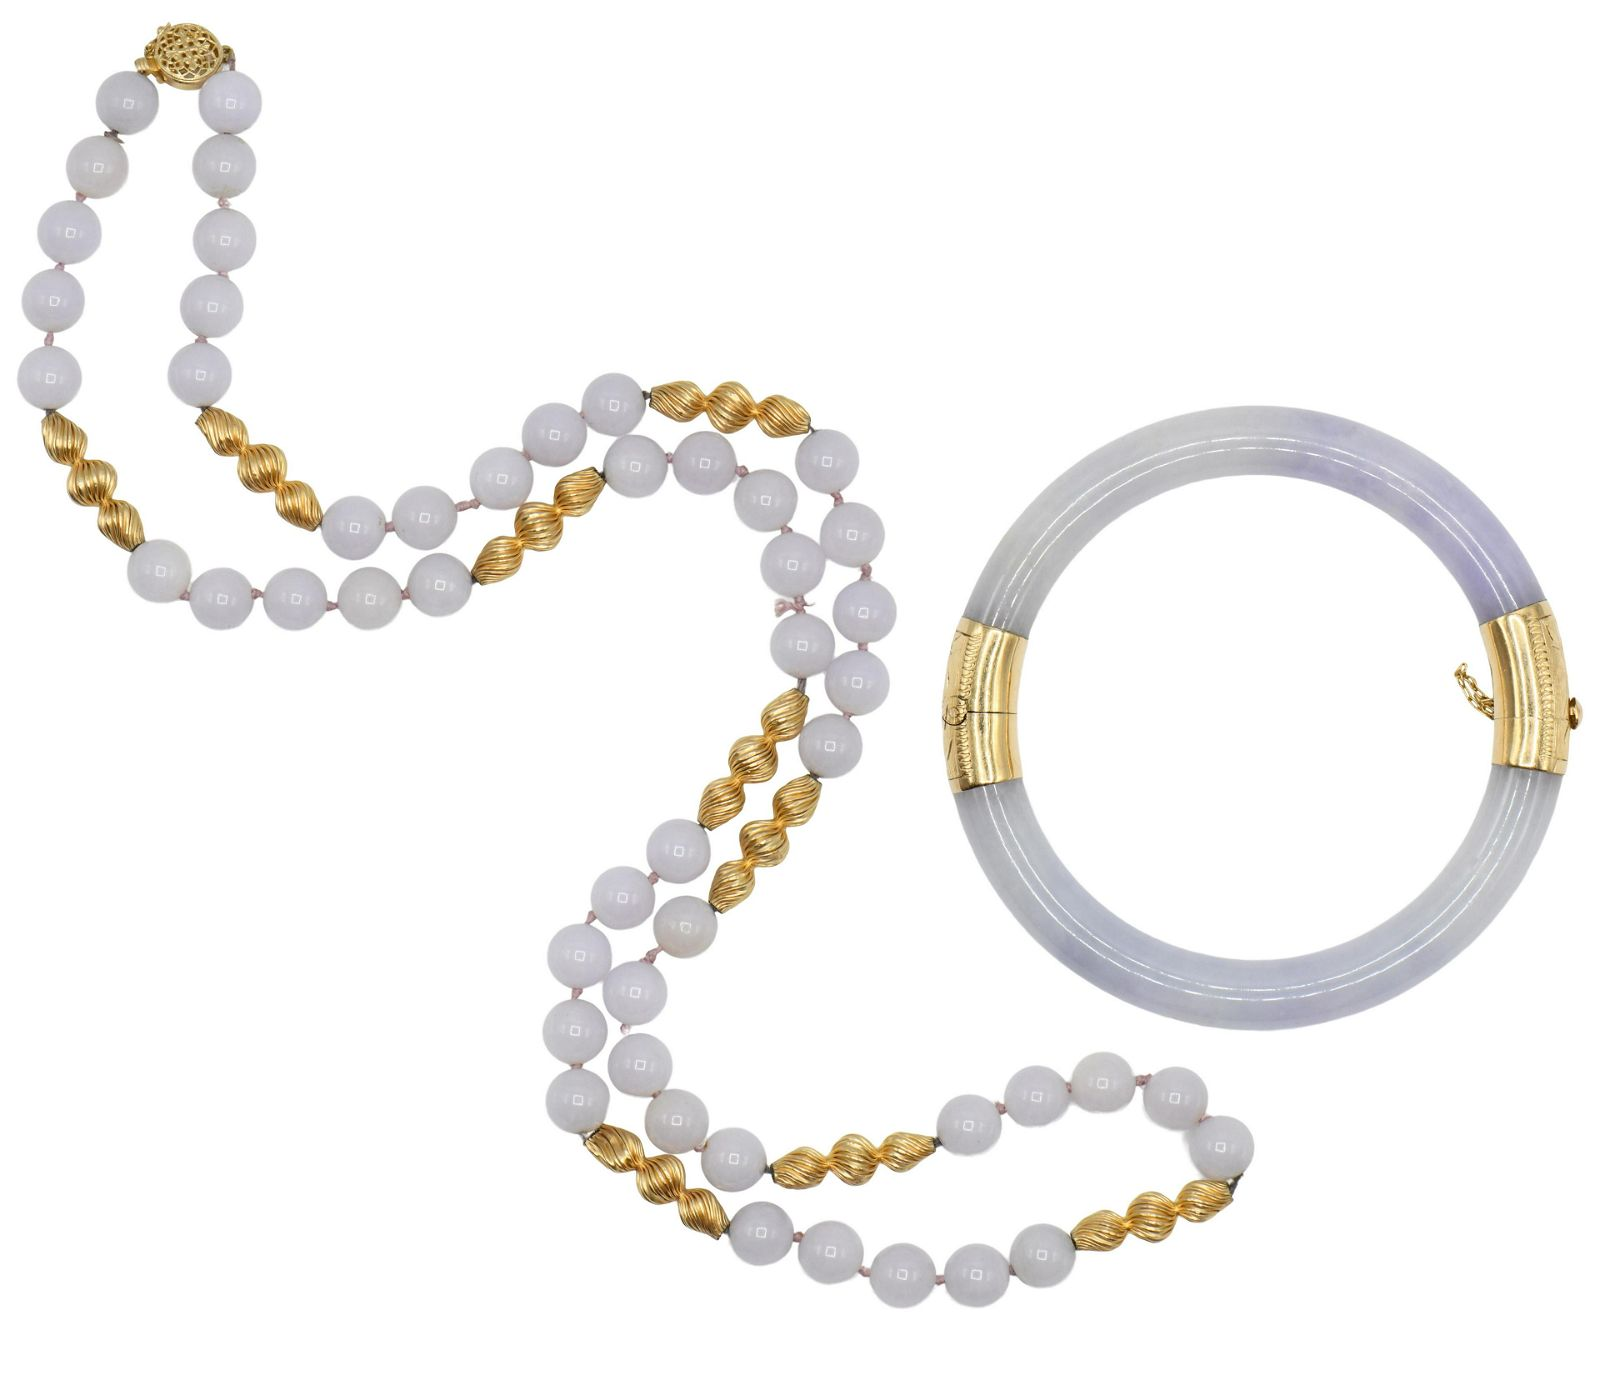 Jade Beaded Necklace & Bangle